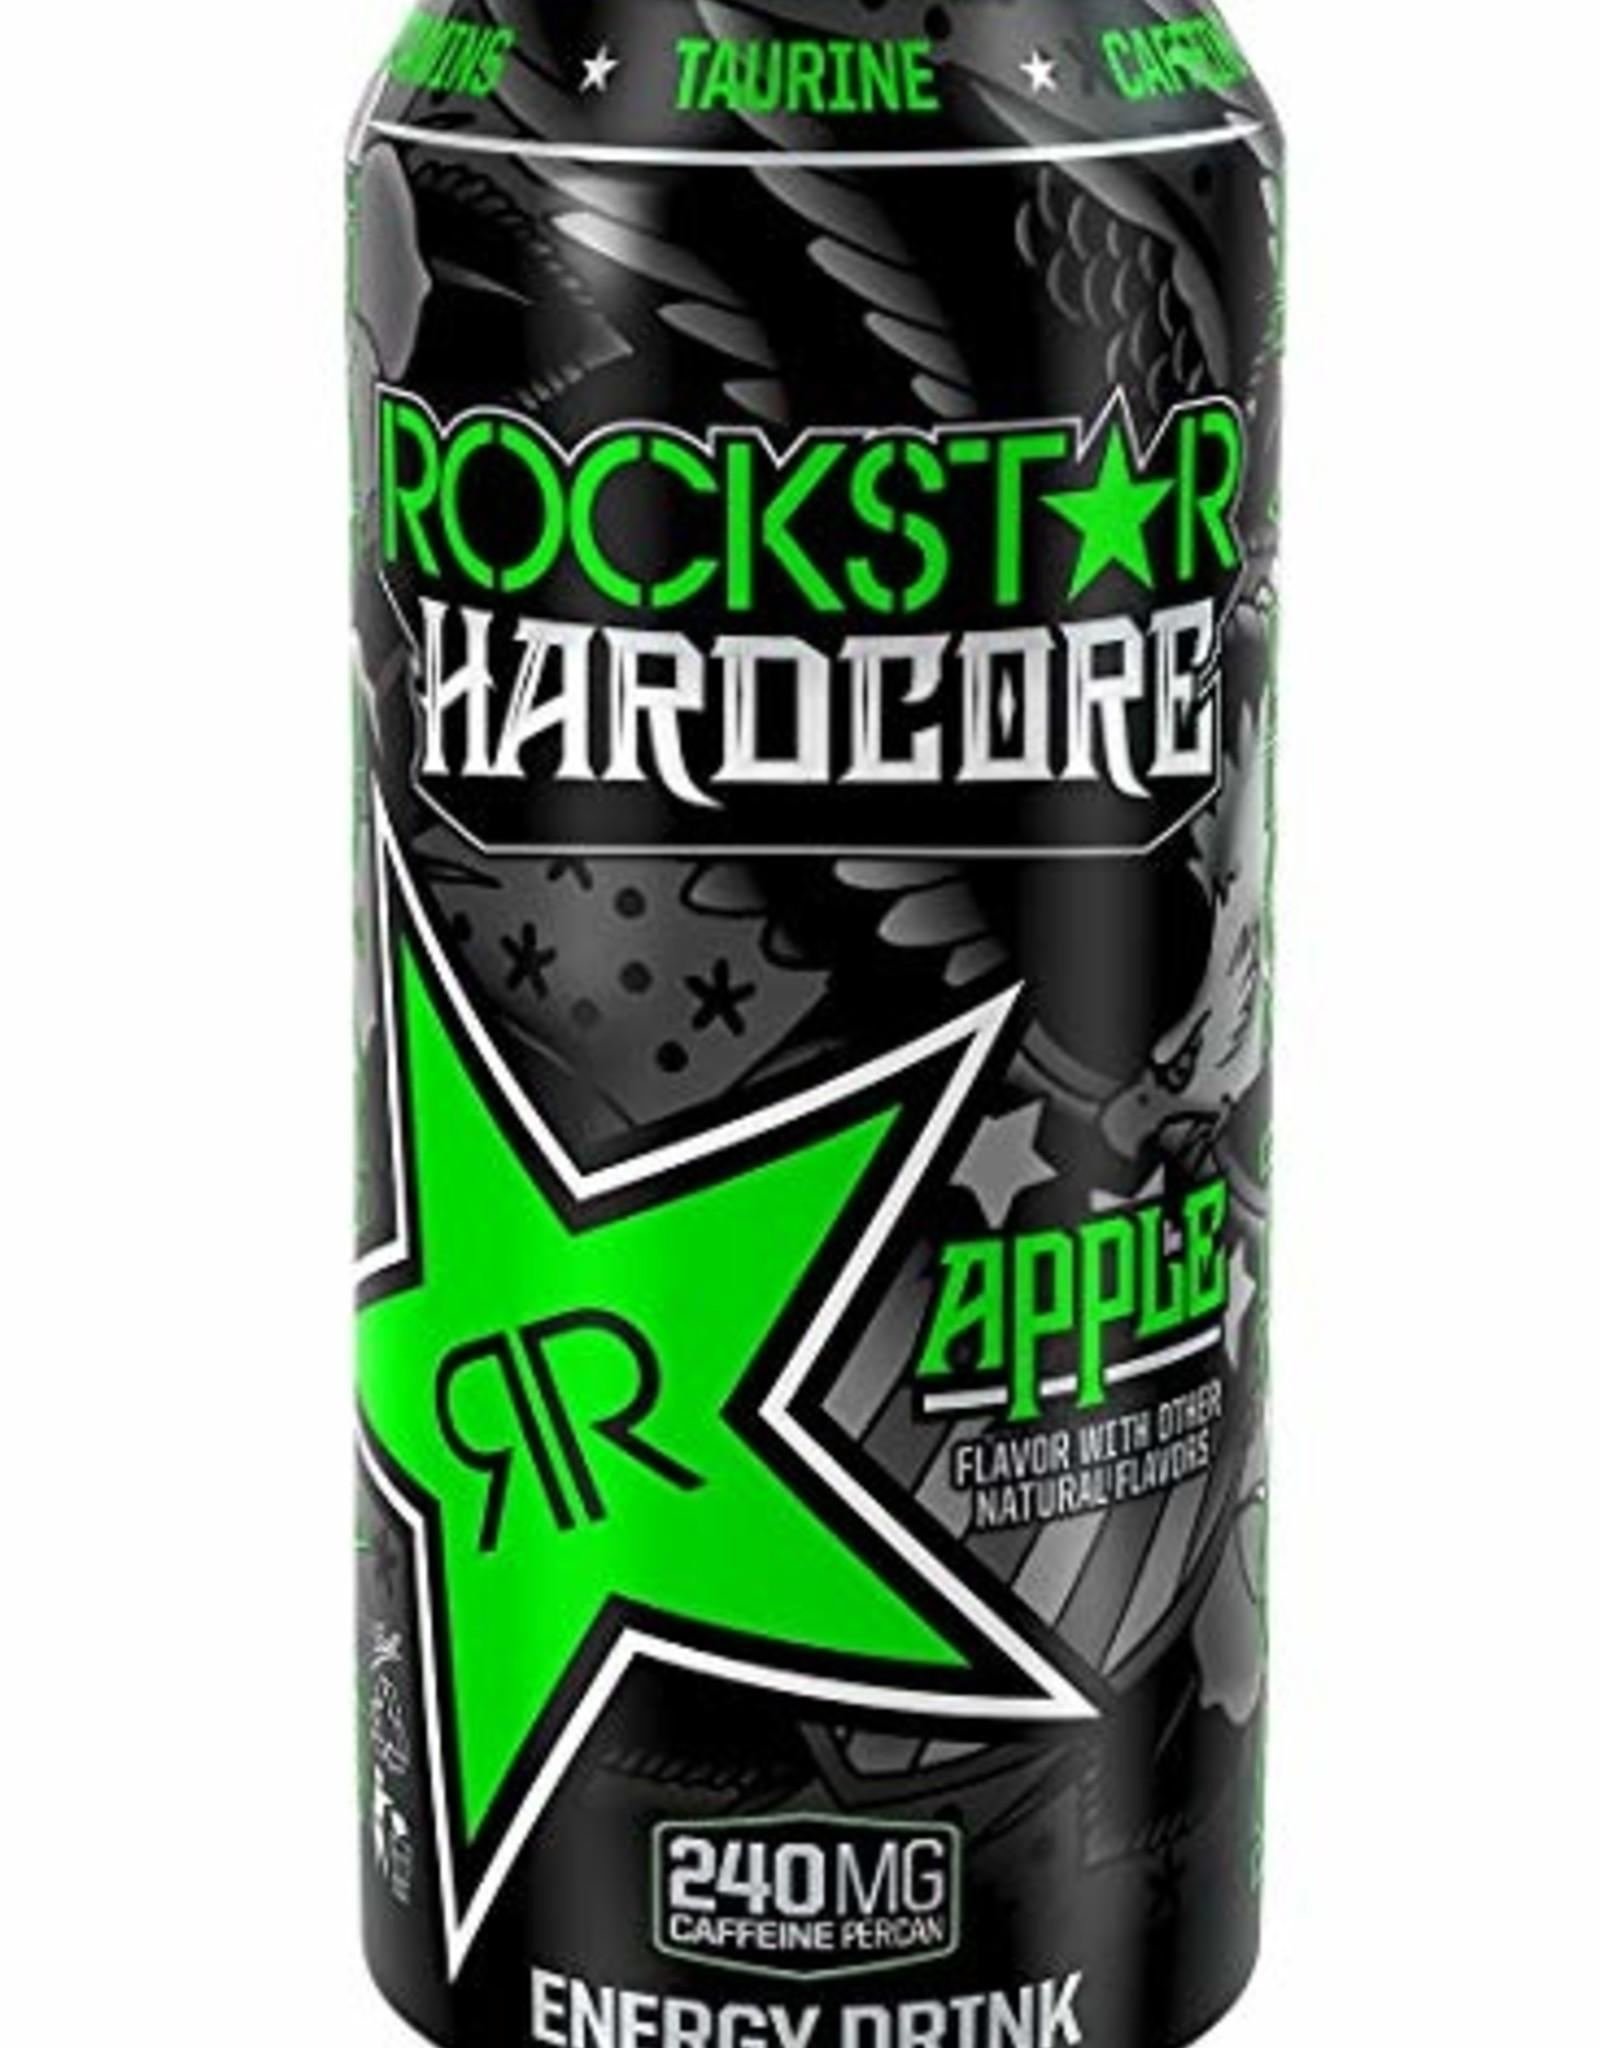 Rockstar Rockstar Hardcore Apple Natural Flavours 50 cl